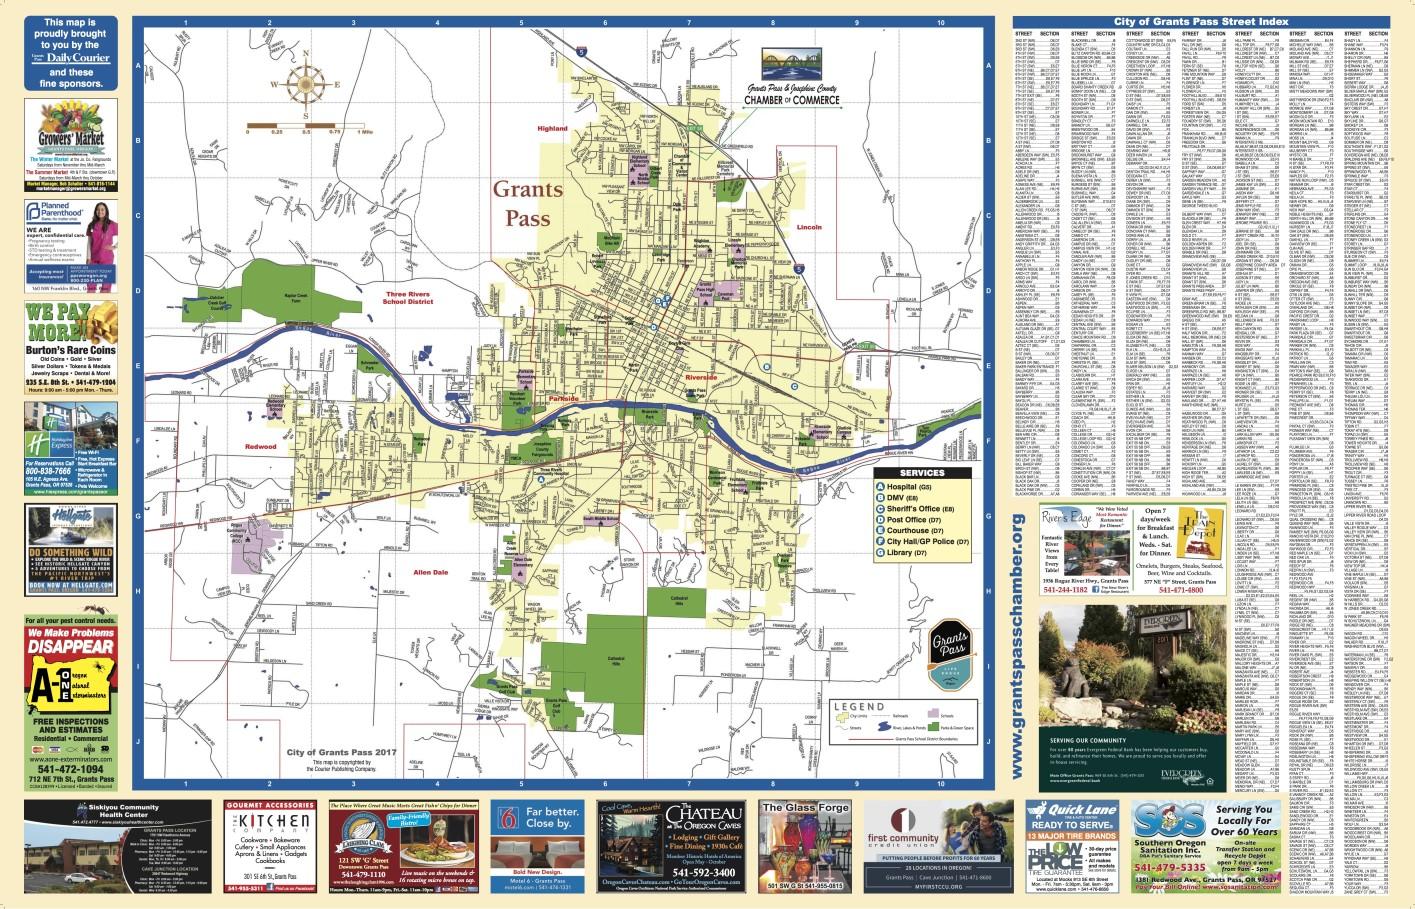 grantspassmap1.jpg